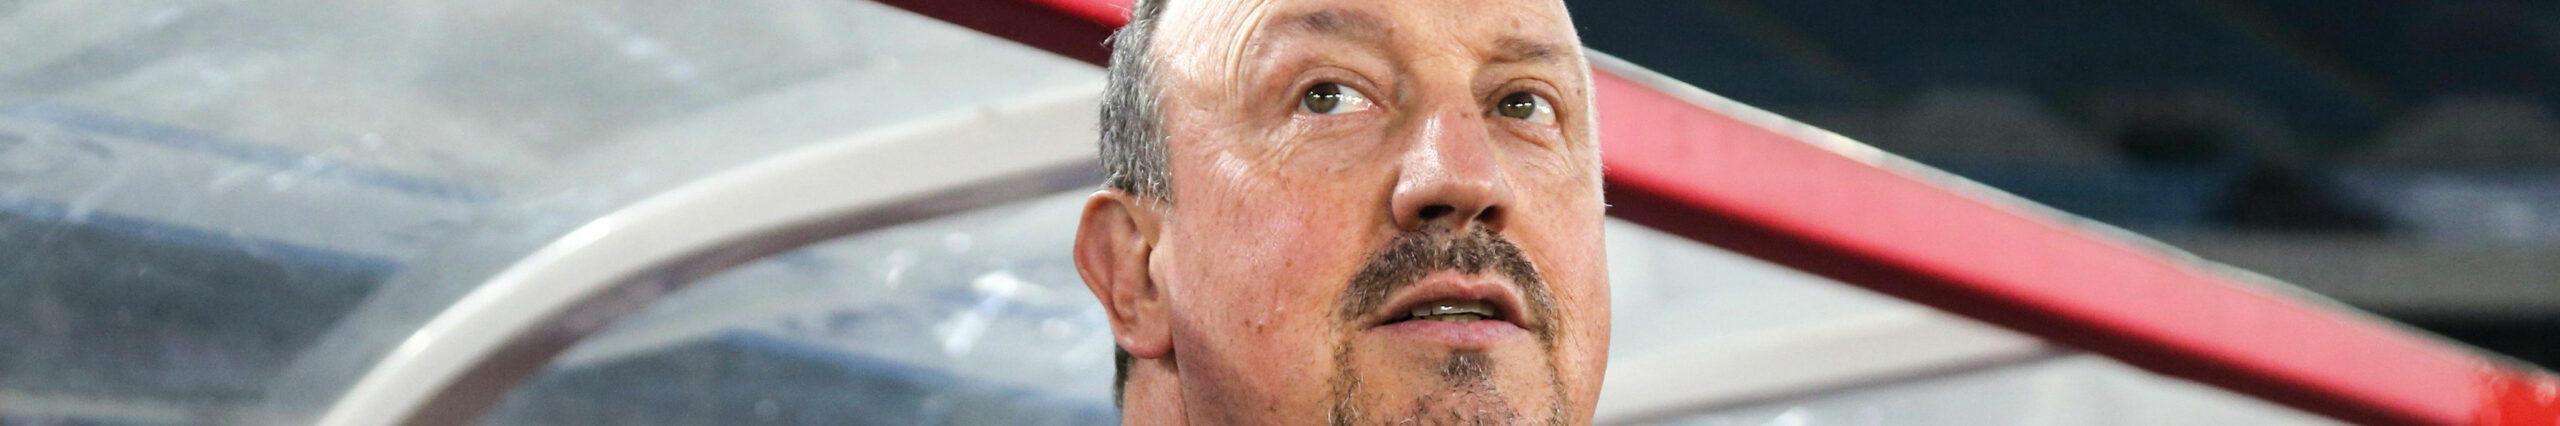 Everton vs Southampton: Benitez can win over critics